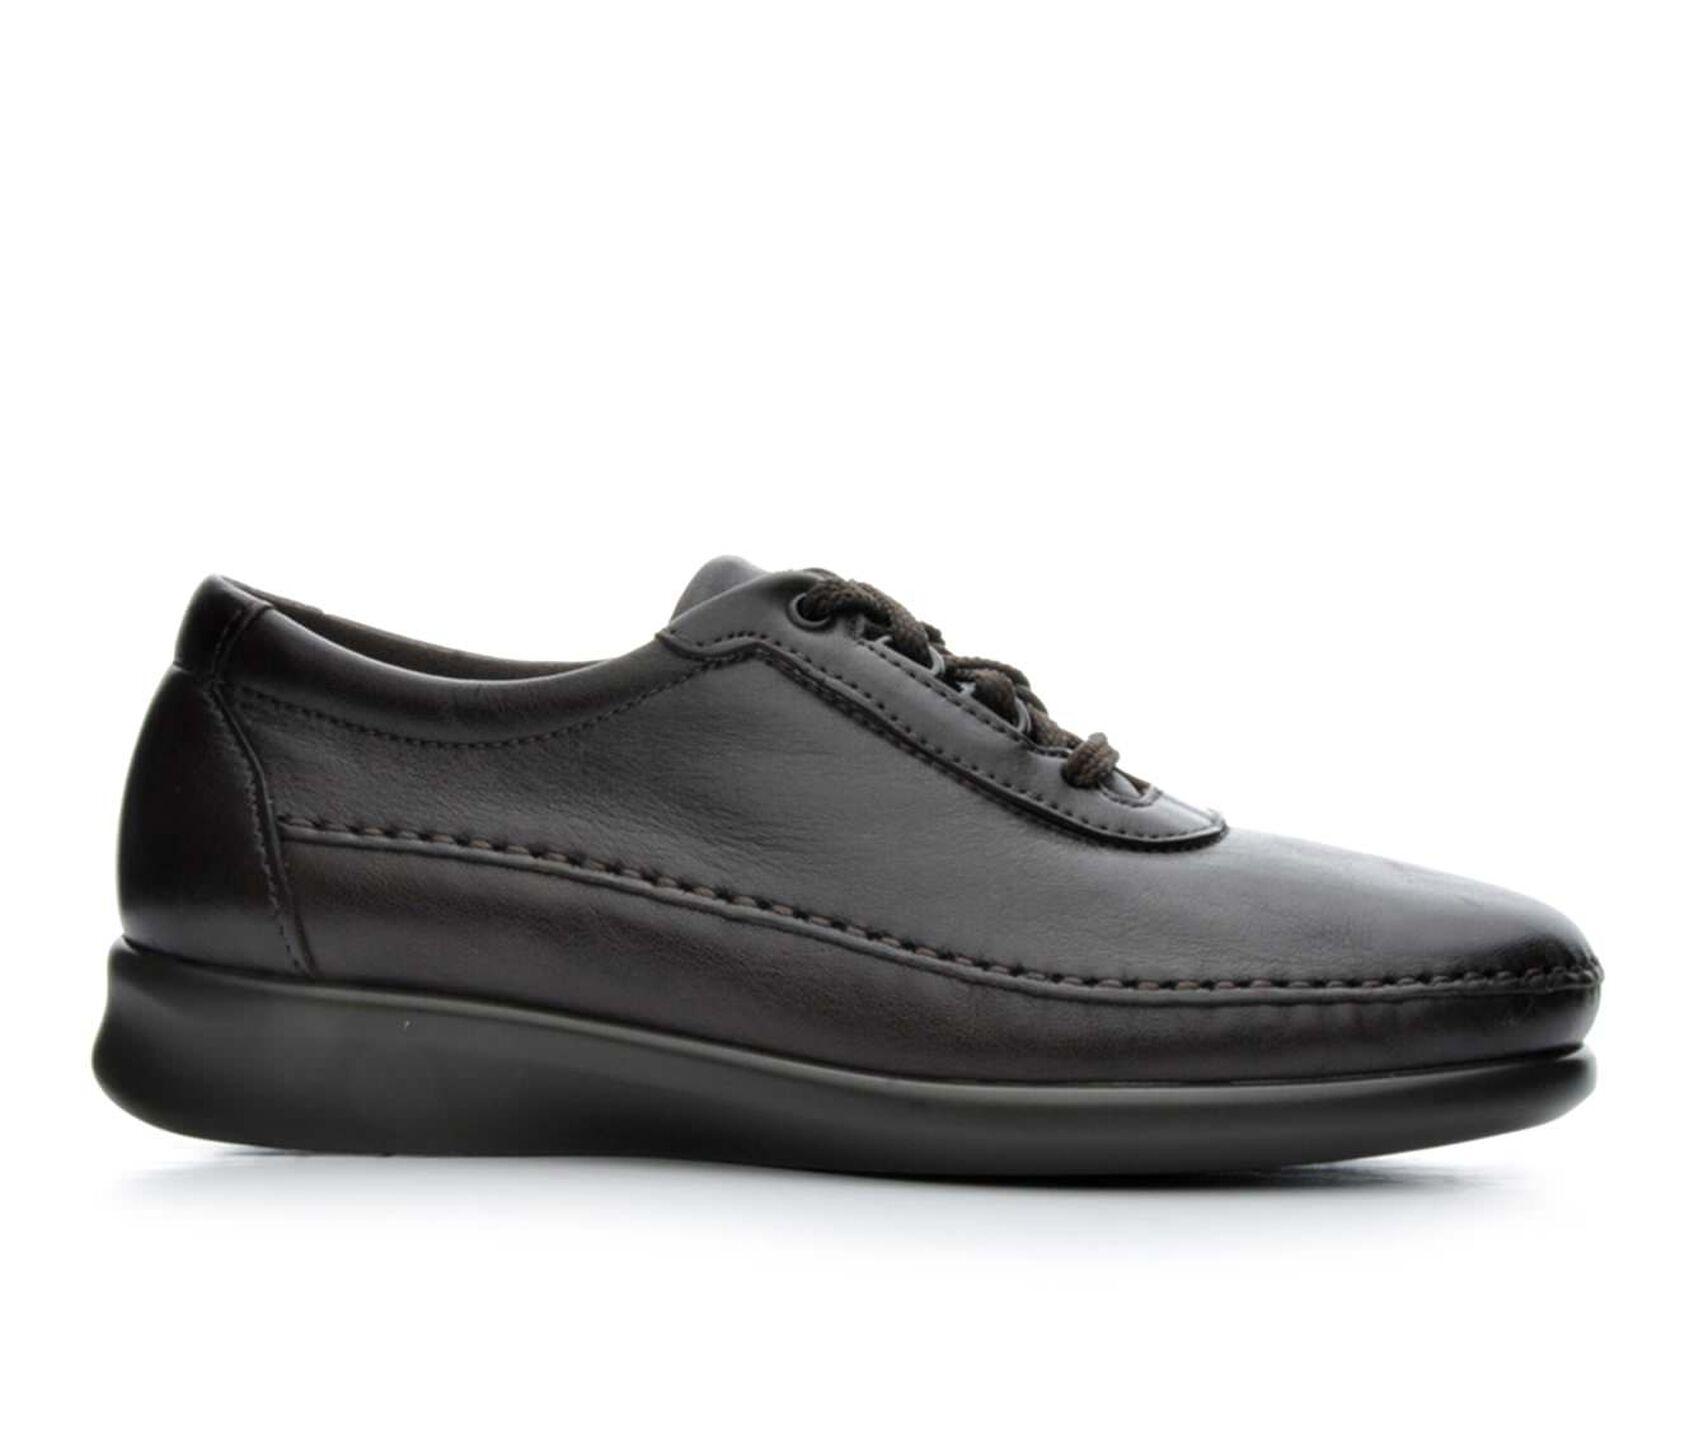 09ef4bae65c Women s Sas Traveler Comfort Shoes